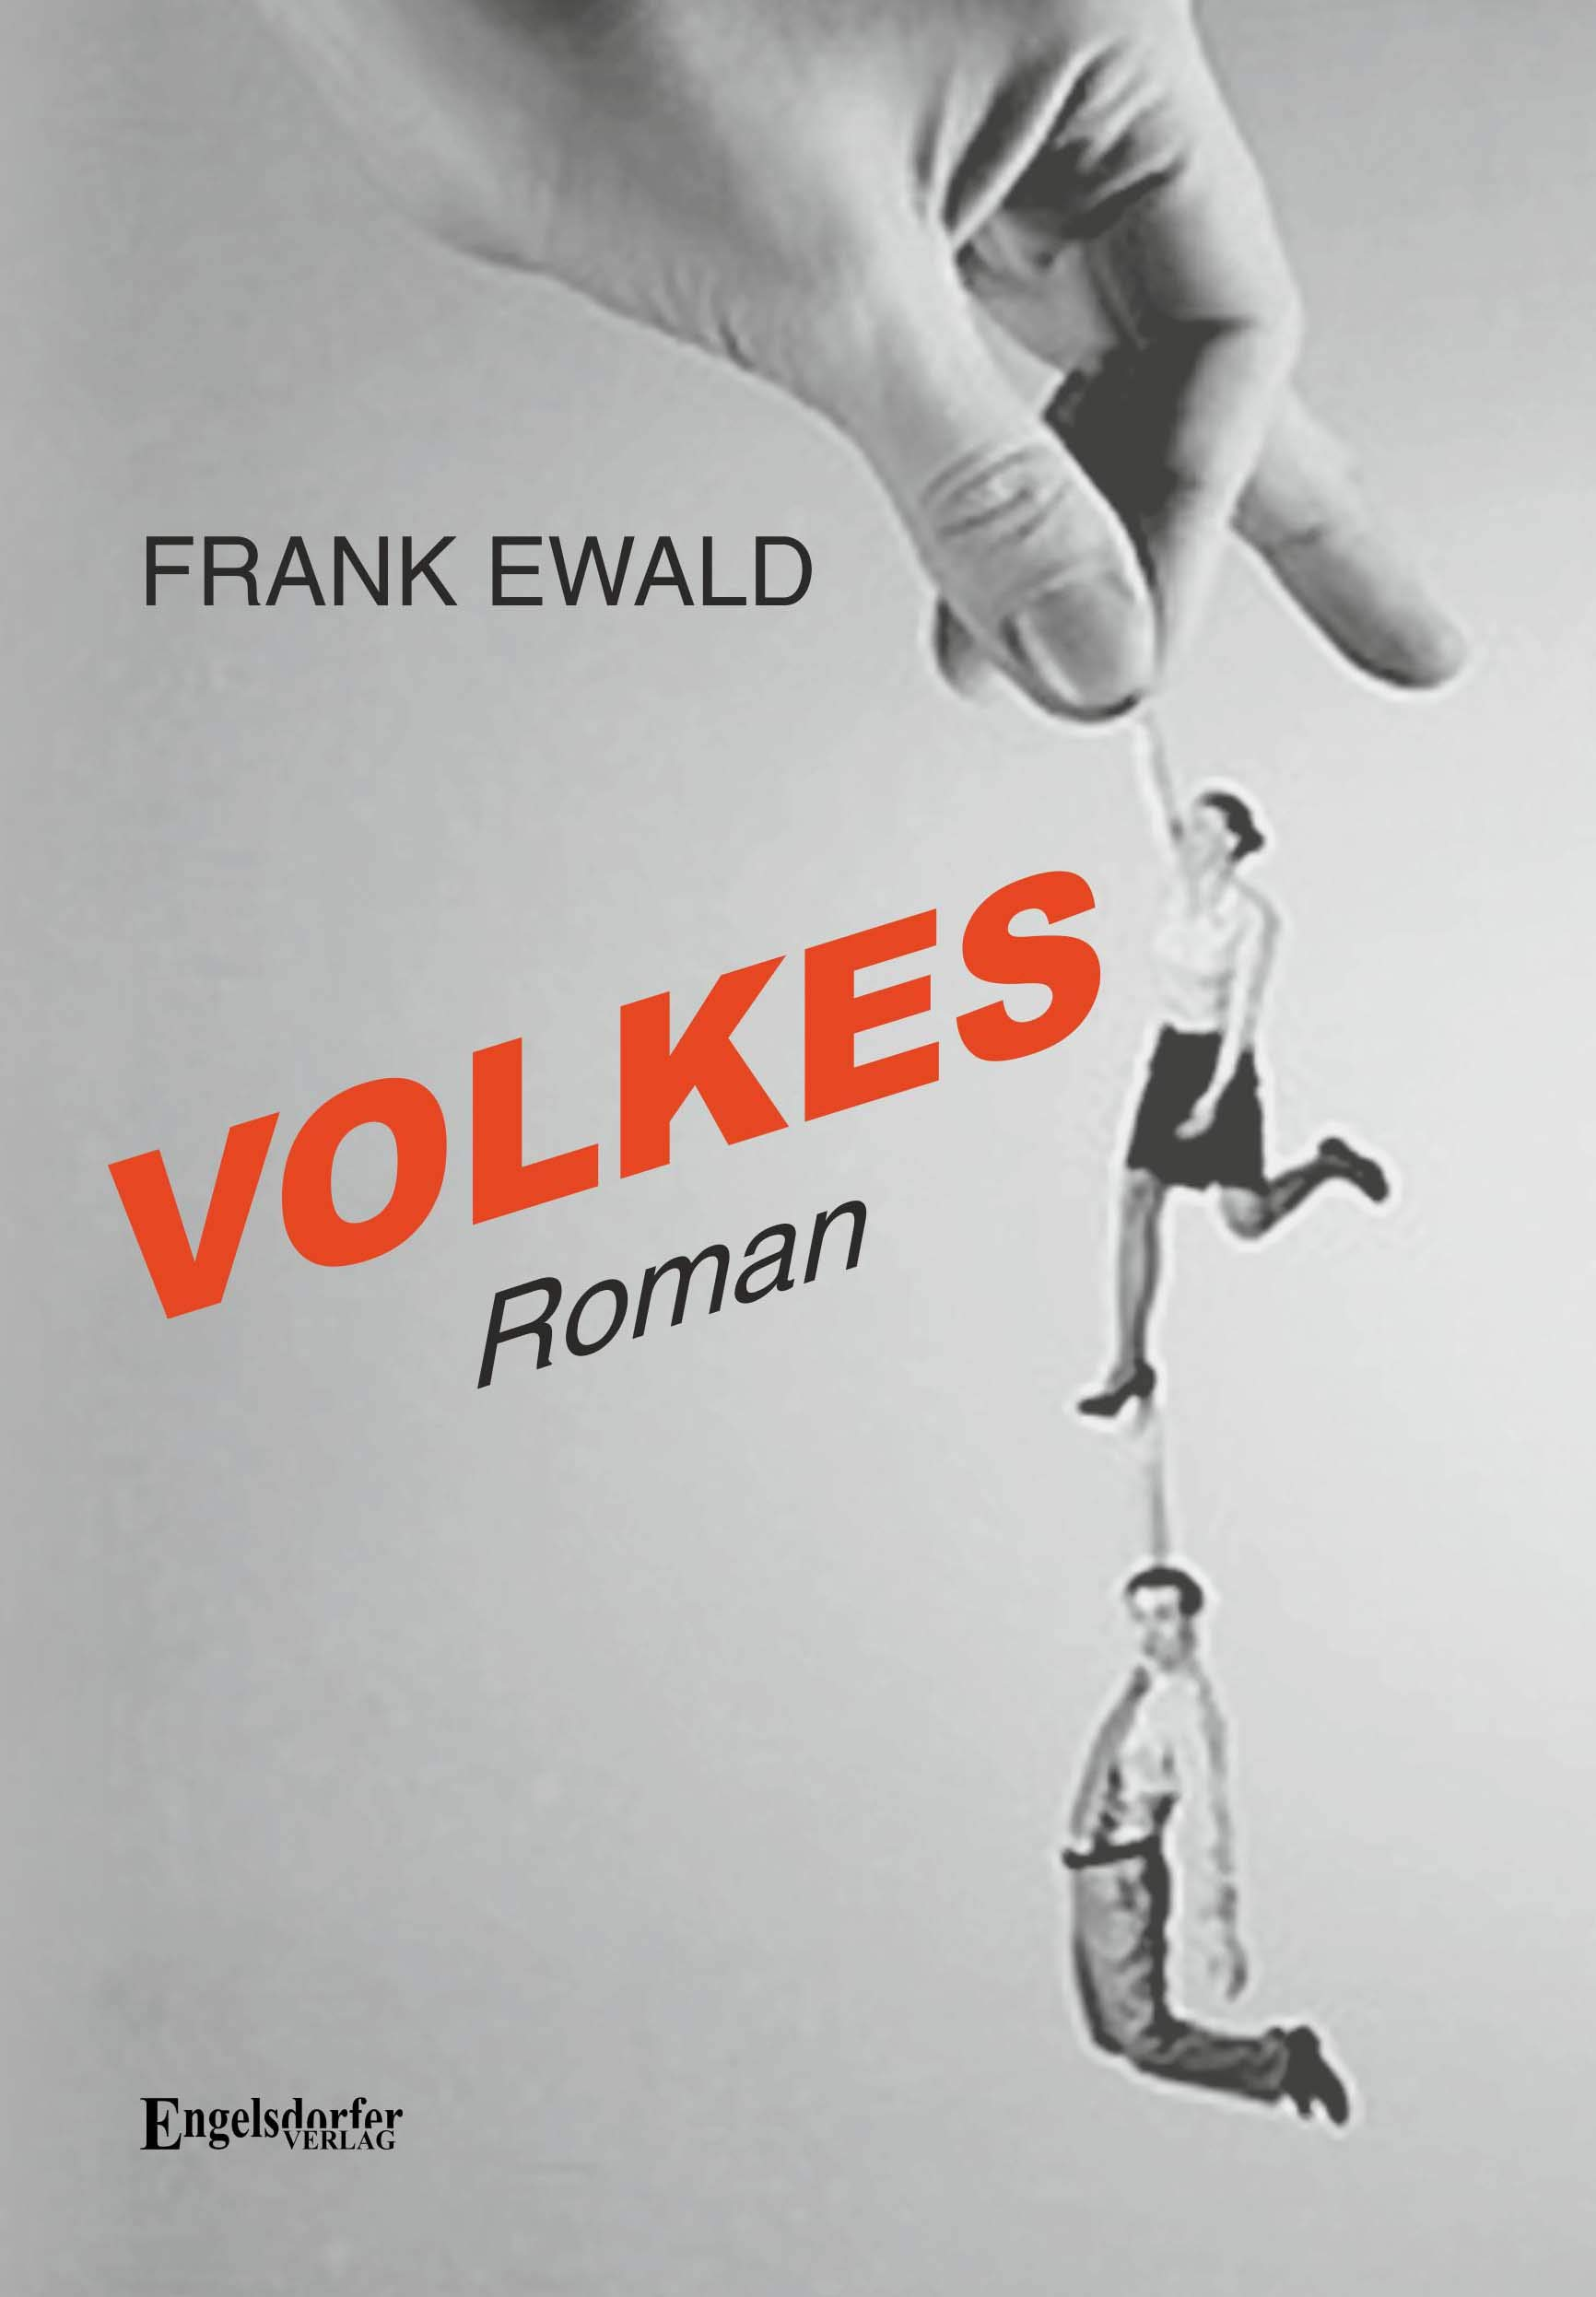 Frank-Ewald-Volkes-Ebgelsdorfer